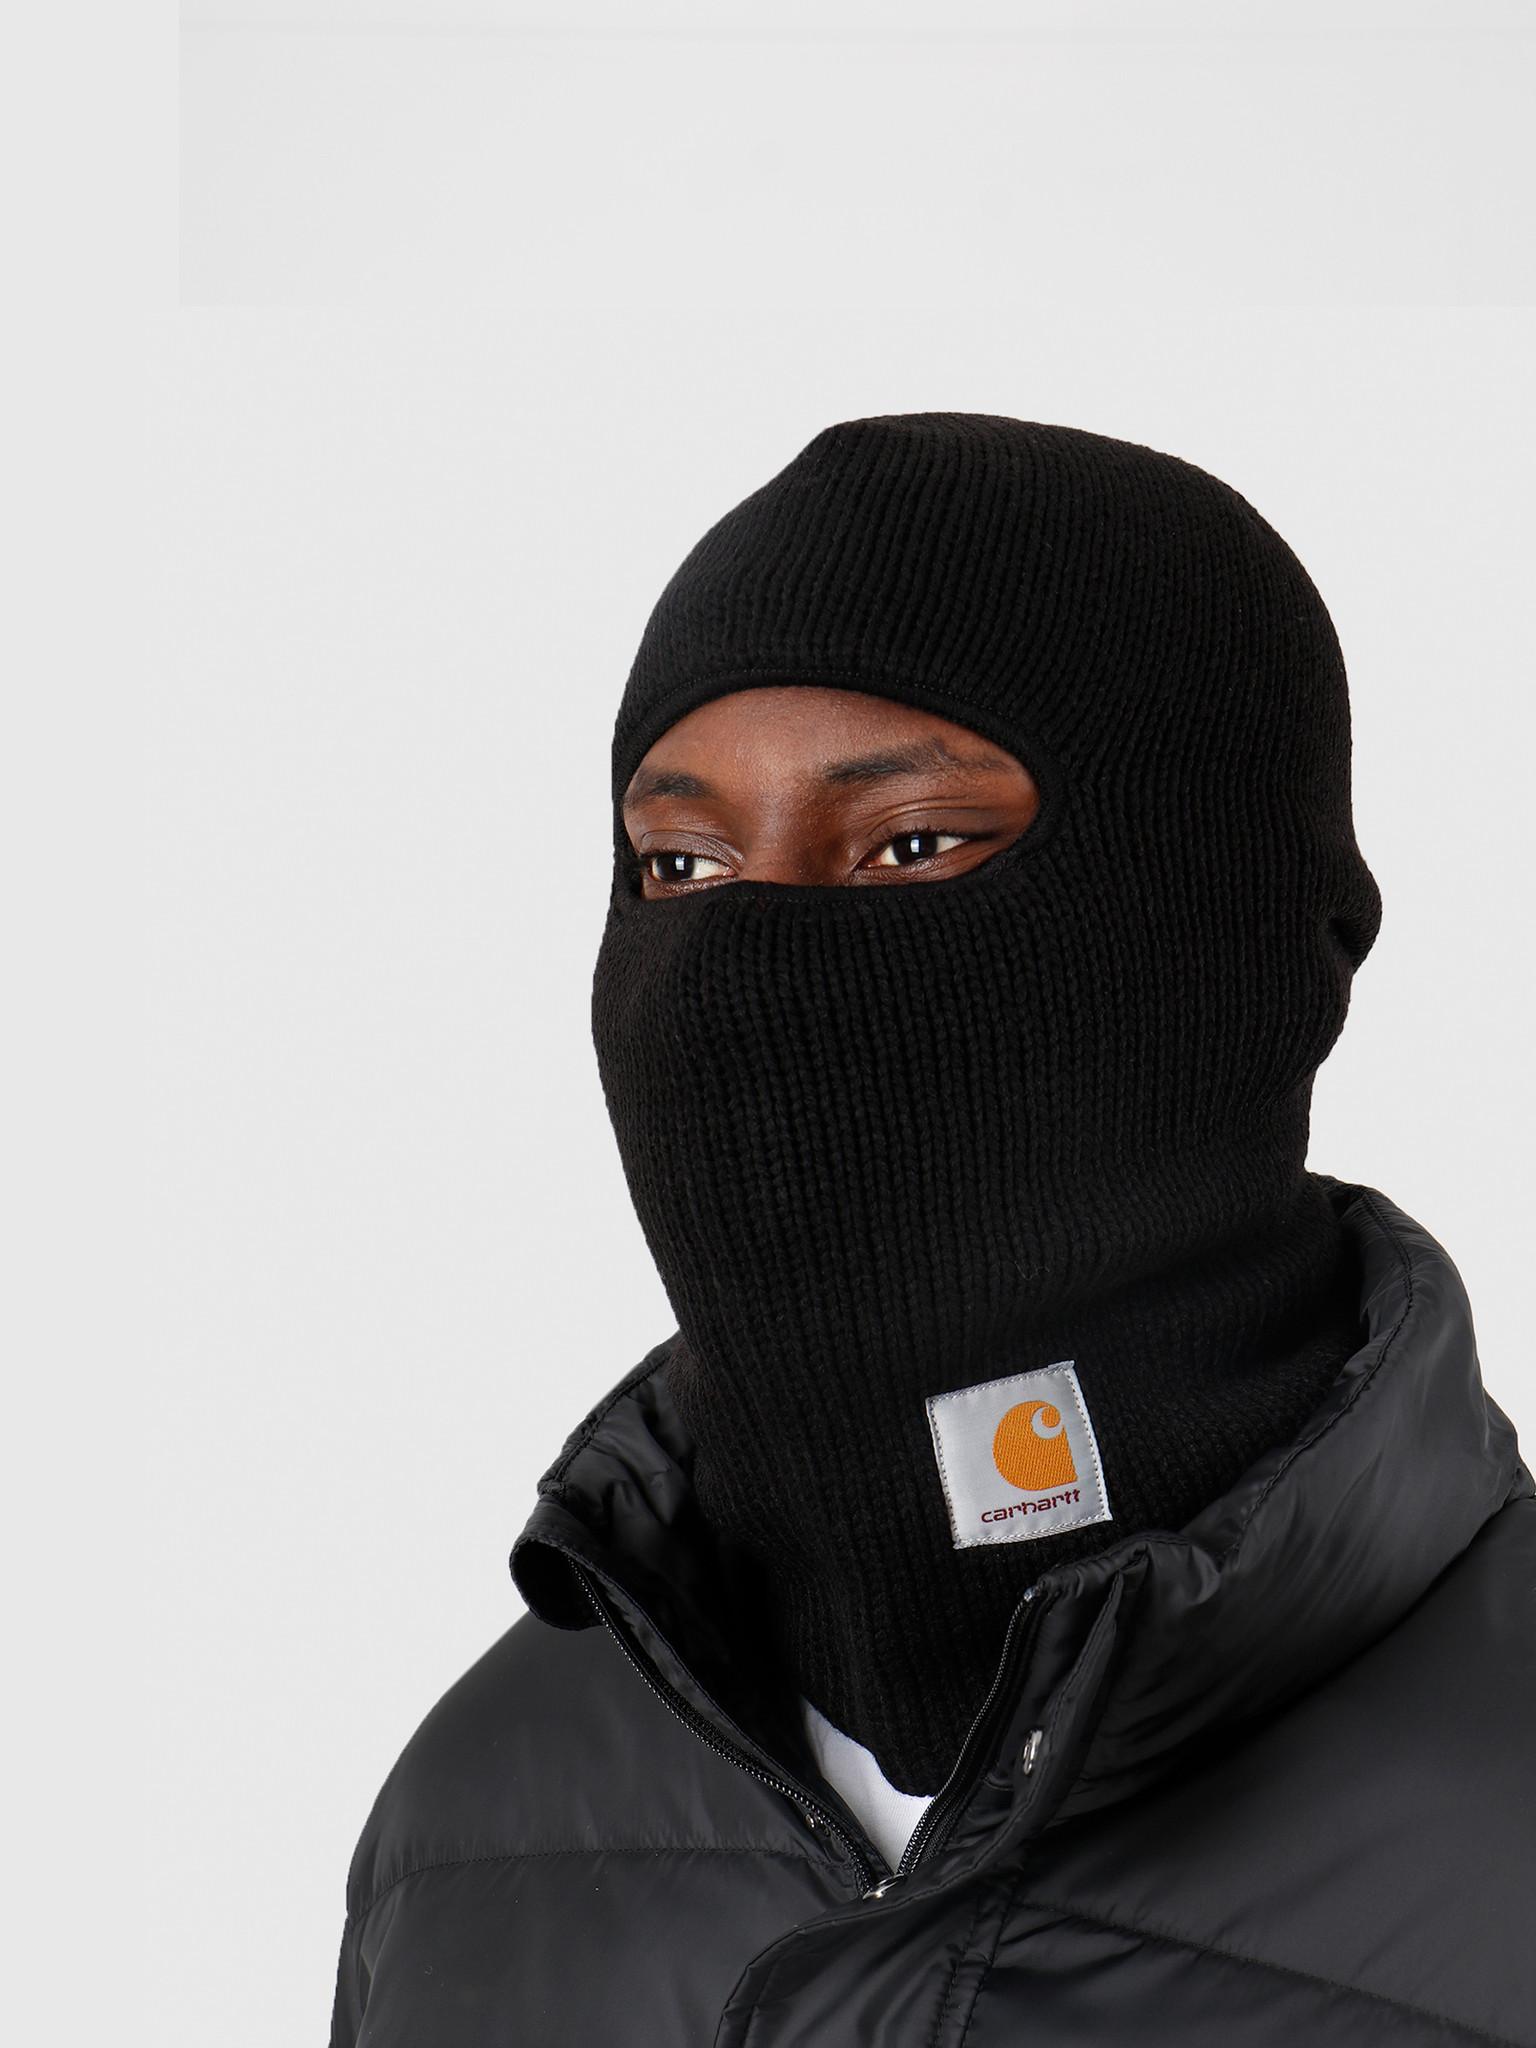 Carhartt WIP Carhartt WIP Storm Mask Black I025394-8900